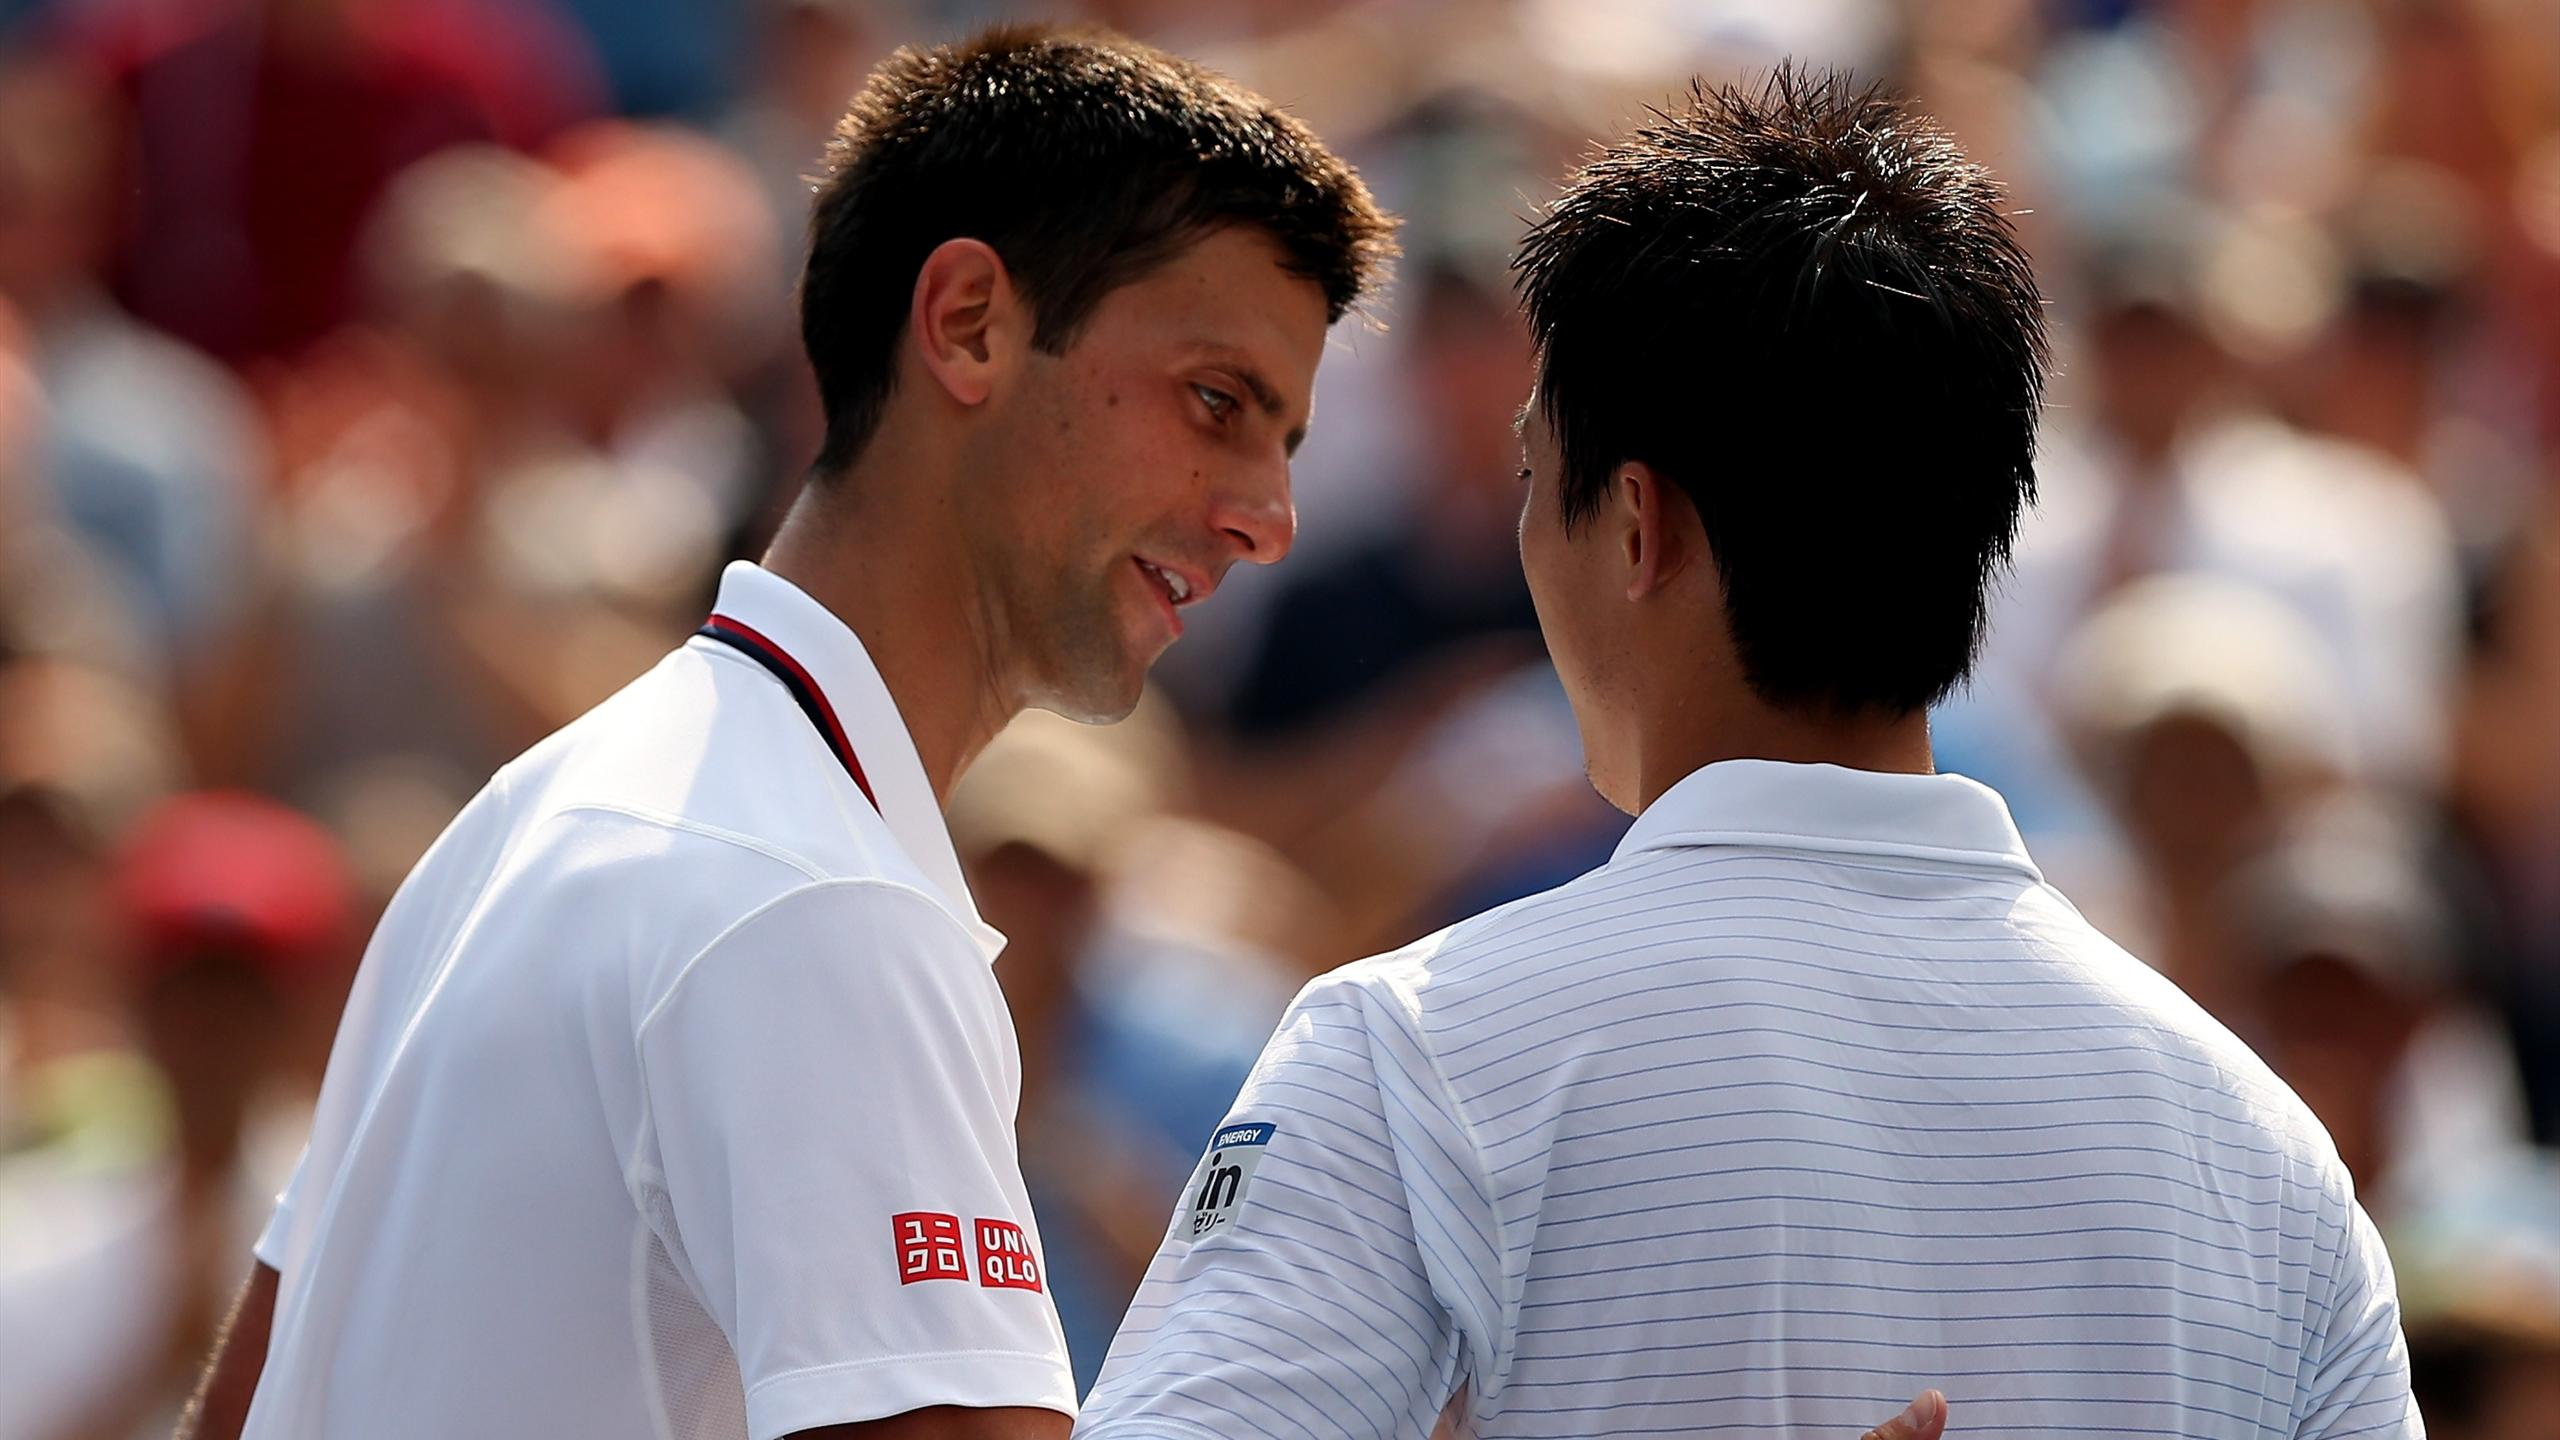 Djokovic battu par Nishikori en demi-finale de l'US Open 2014